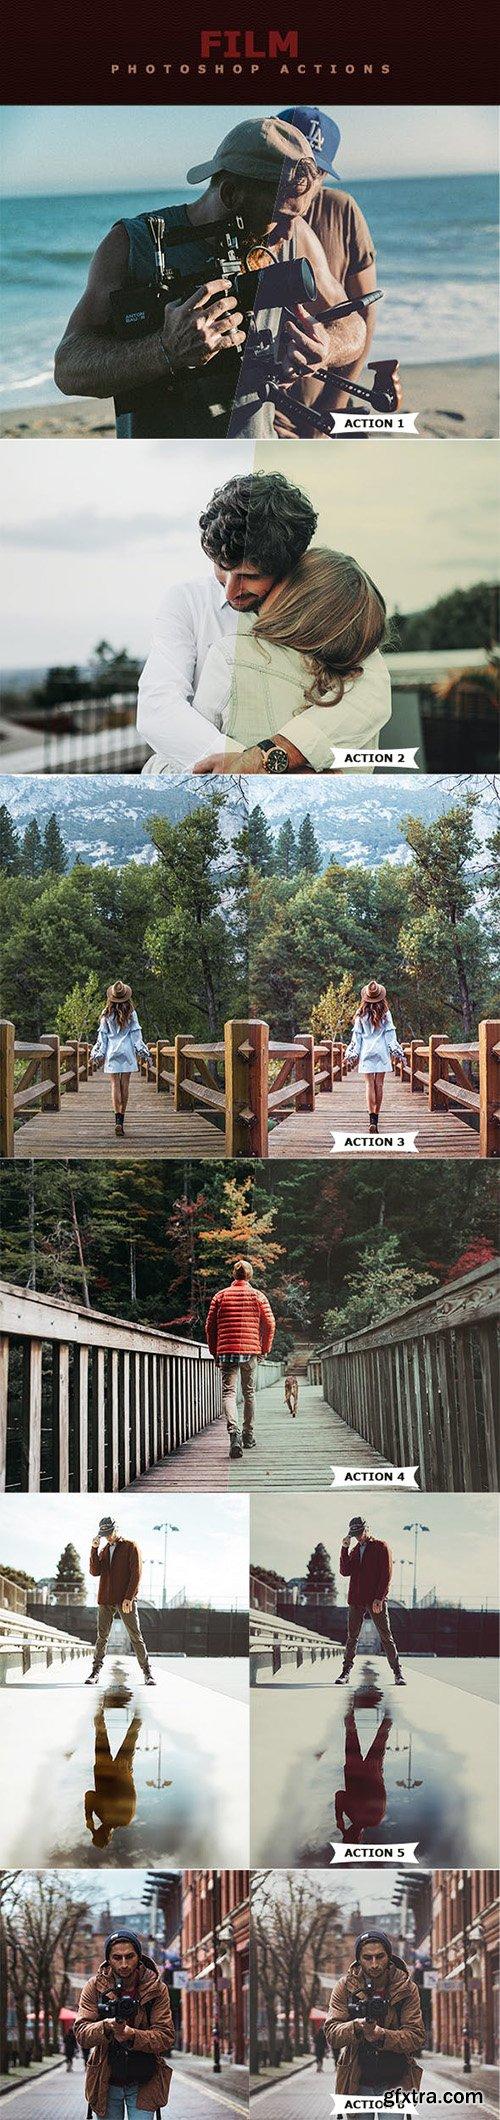 Graphicriver Film Photoshop Actions 22824285